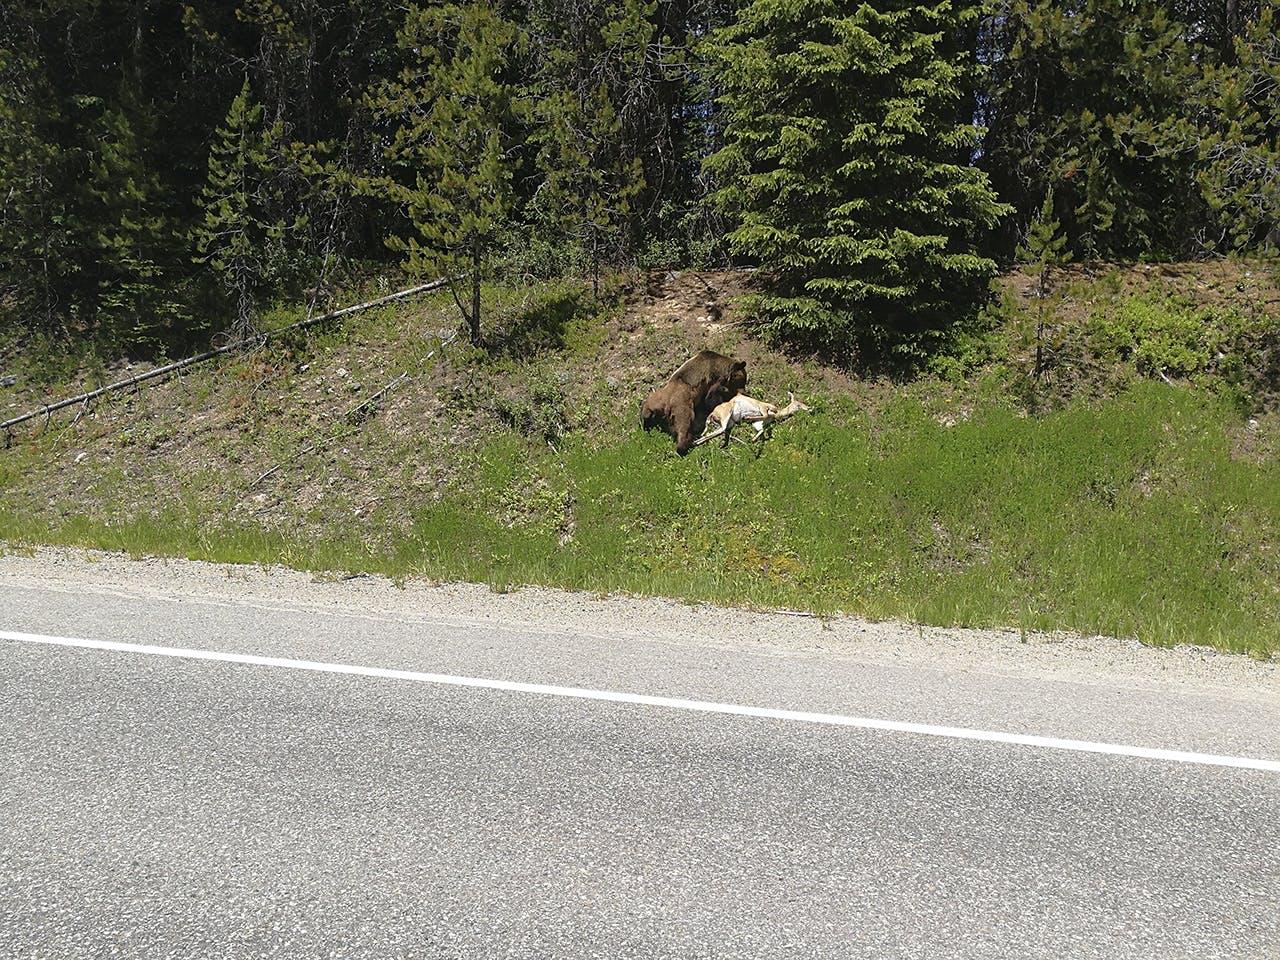 bjørn bambi canada